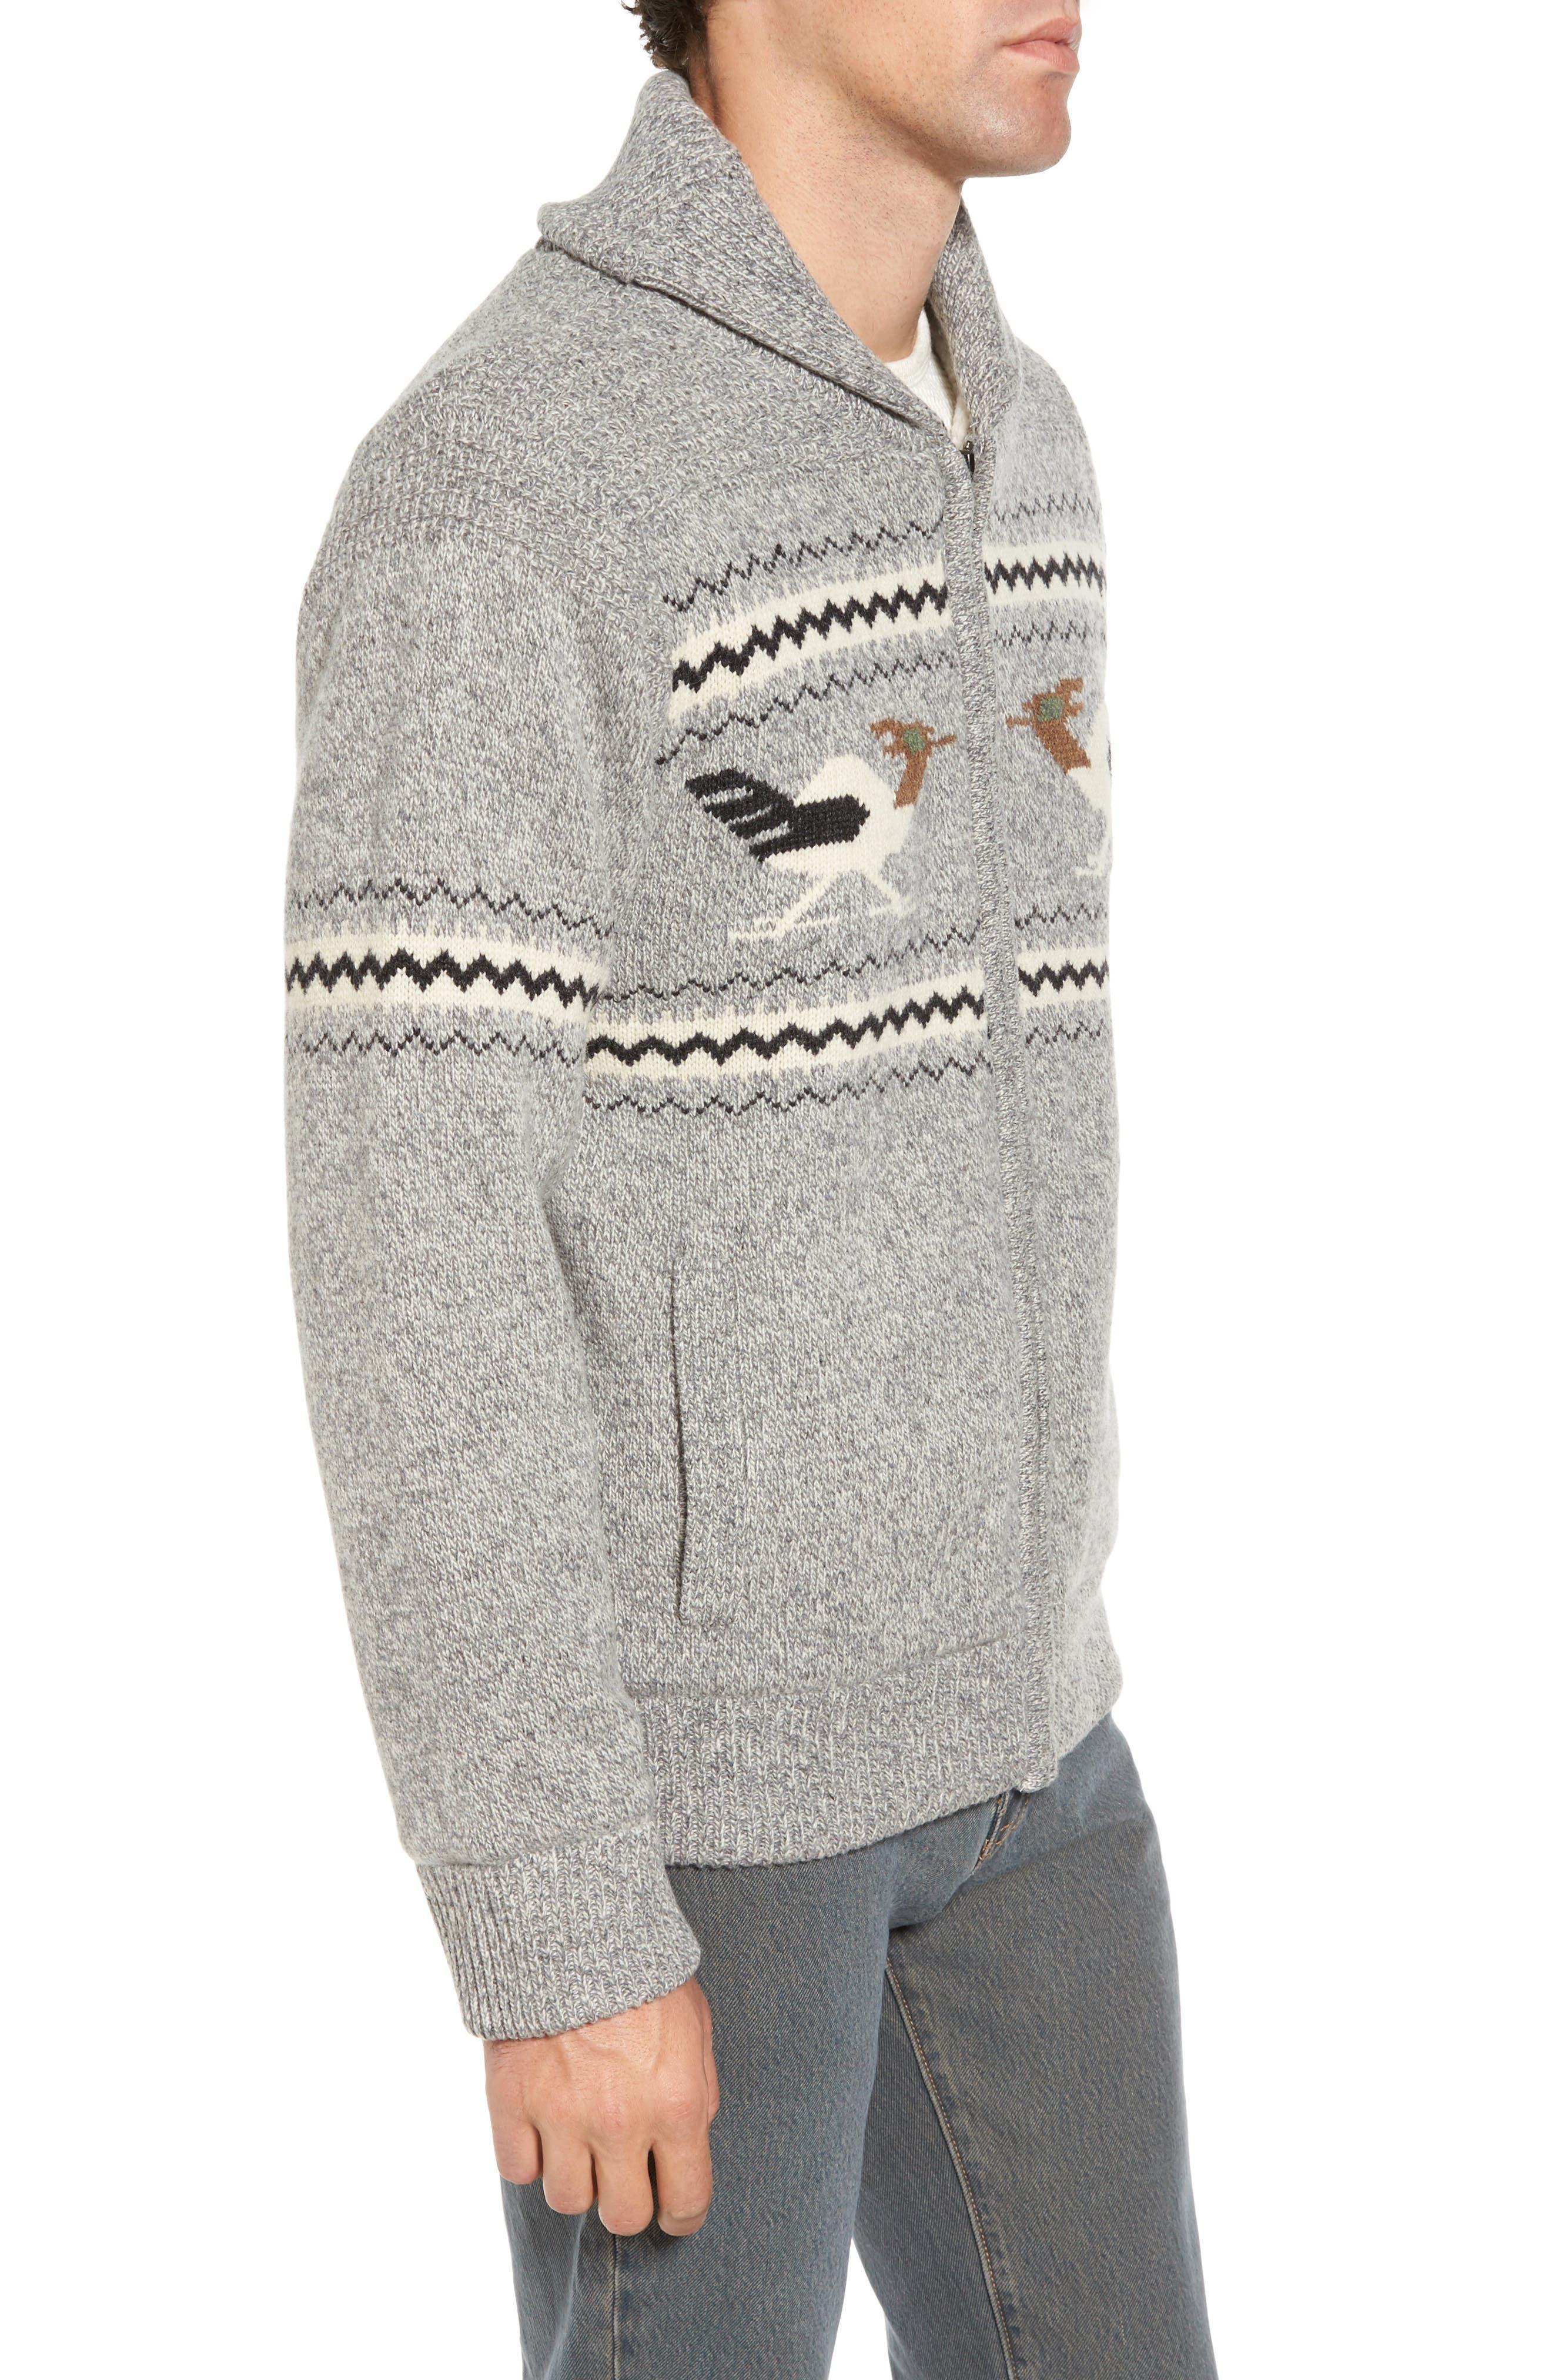 Road Runner Wool Blend Cardigan,                             Alternate thumbnail 3, color,                             Heather Grey